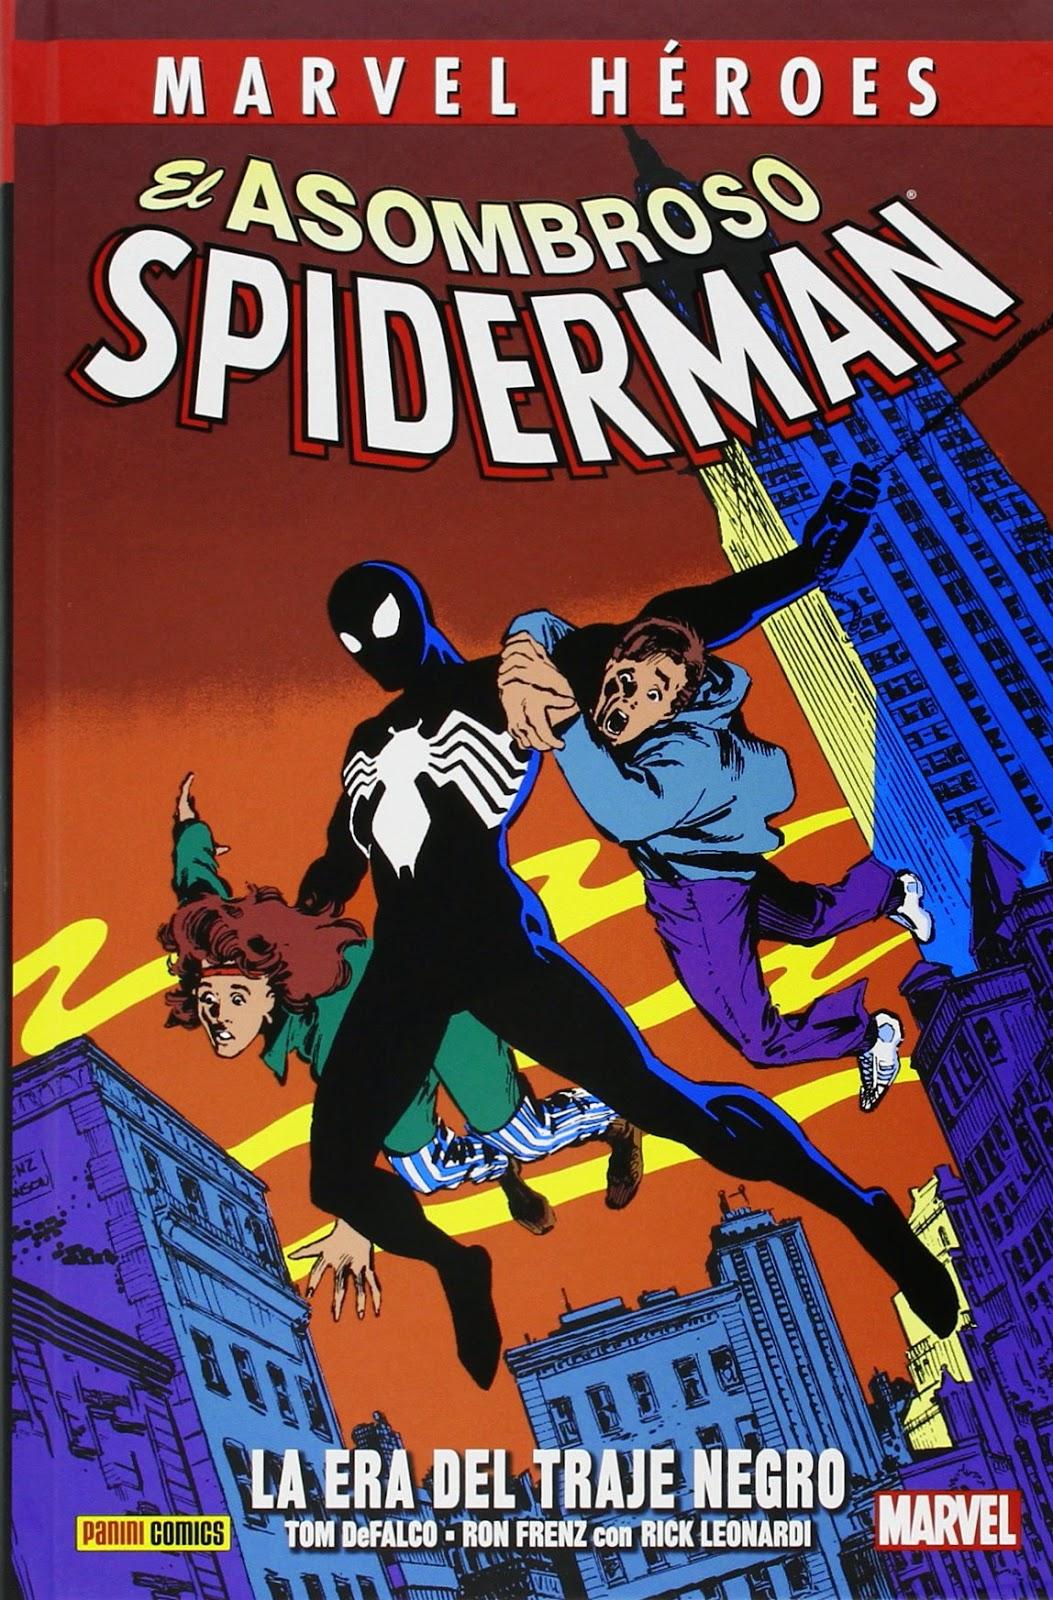 El Asombroso Spiderman. La Era Del Traje Negro